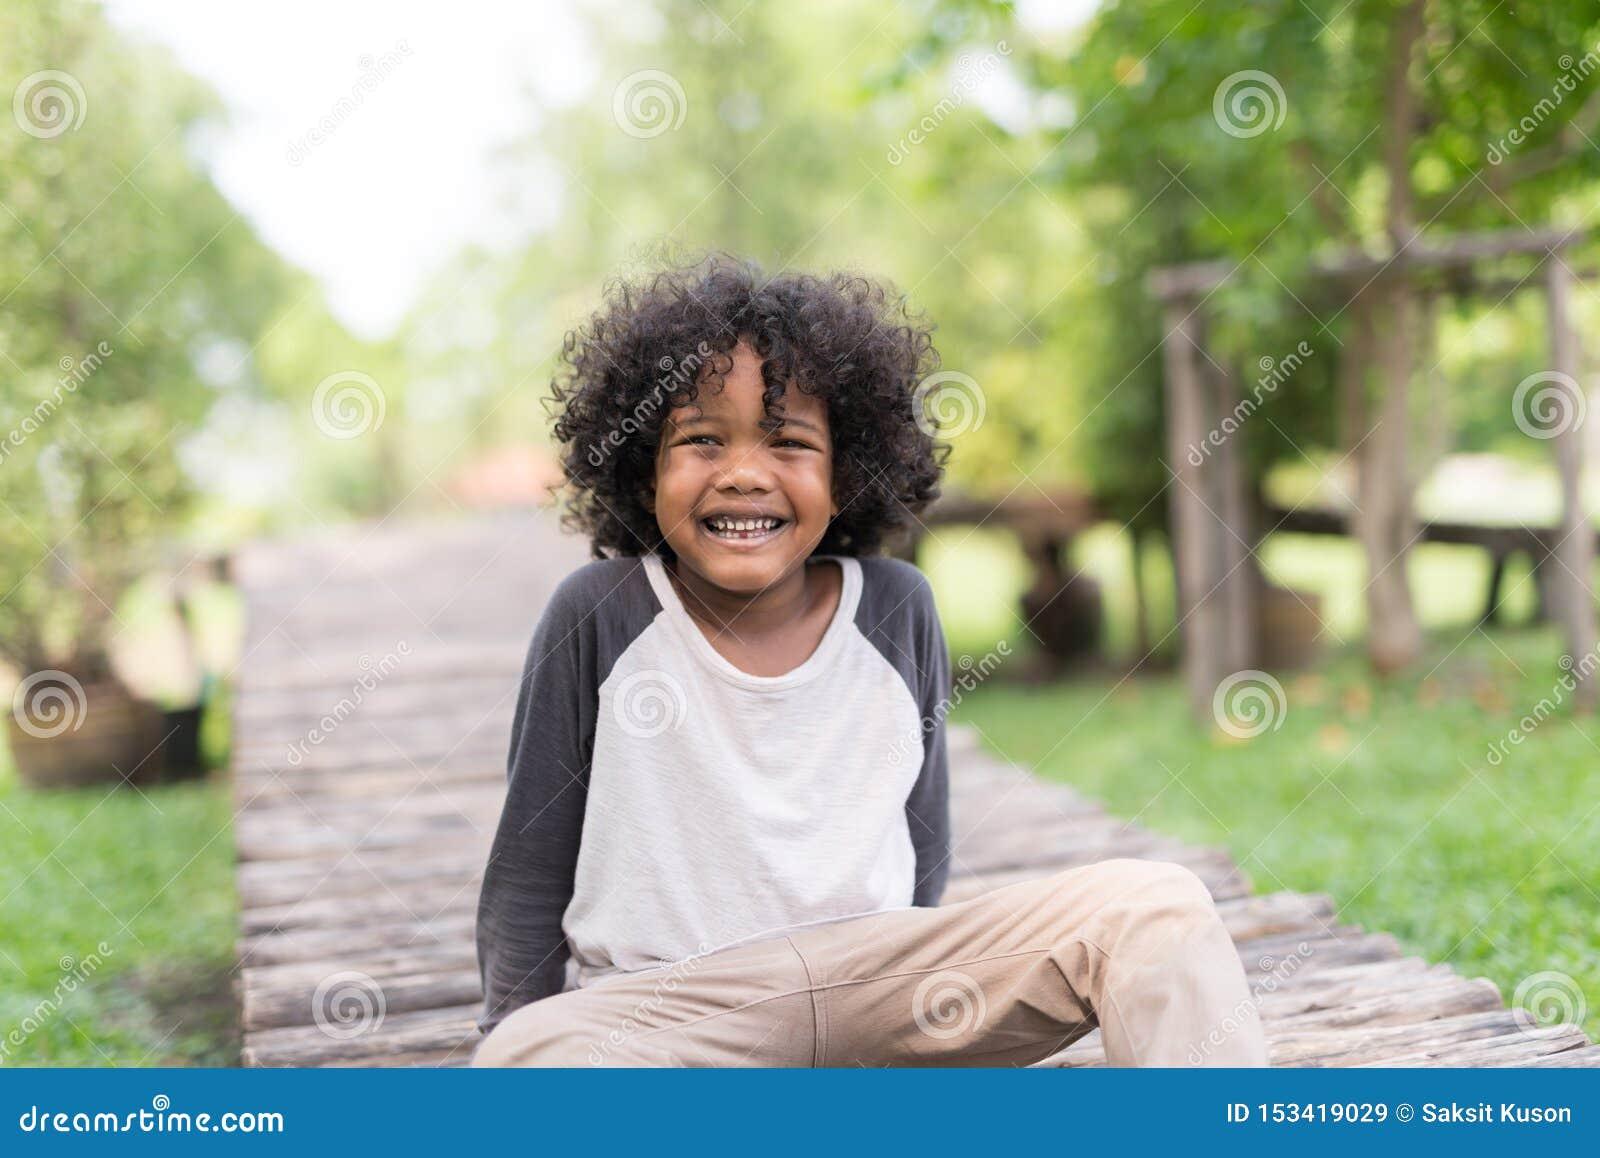 Retrato de um rapaz pequeno afro-americano bonito que sorri no parque natural